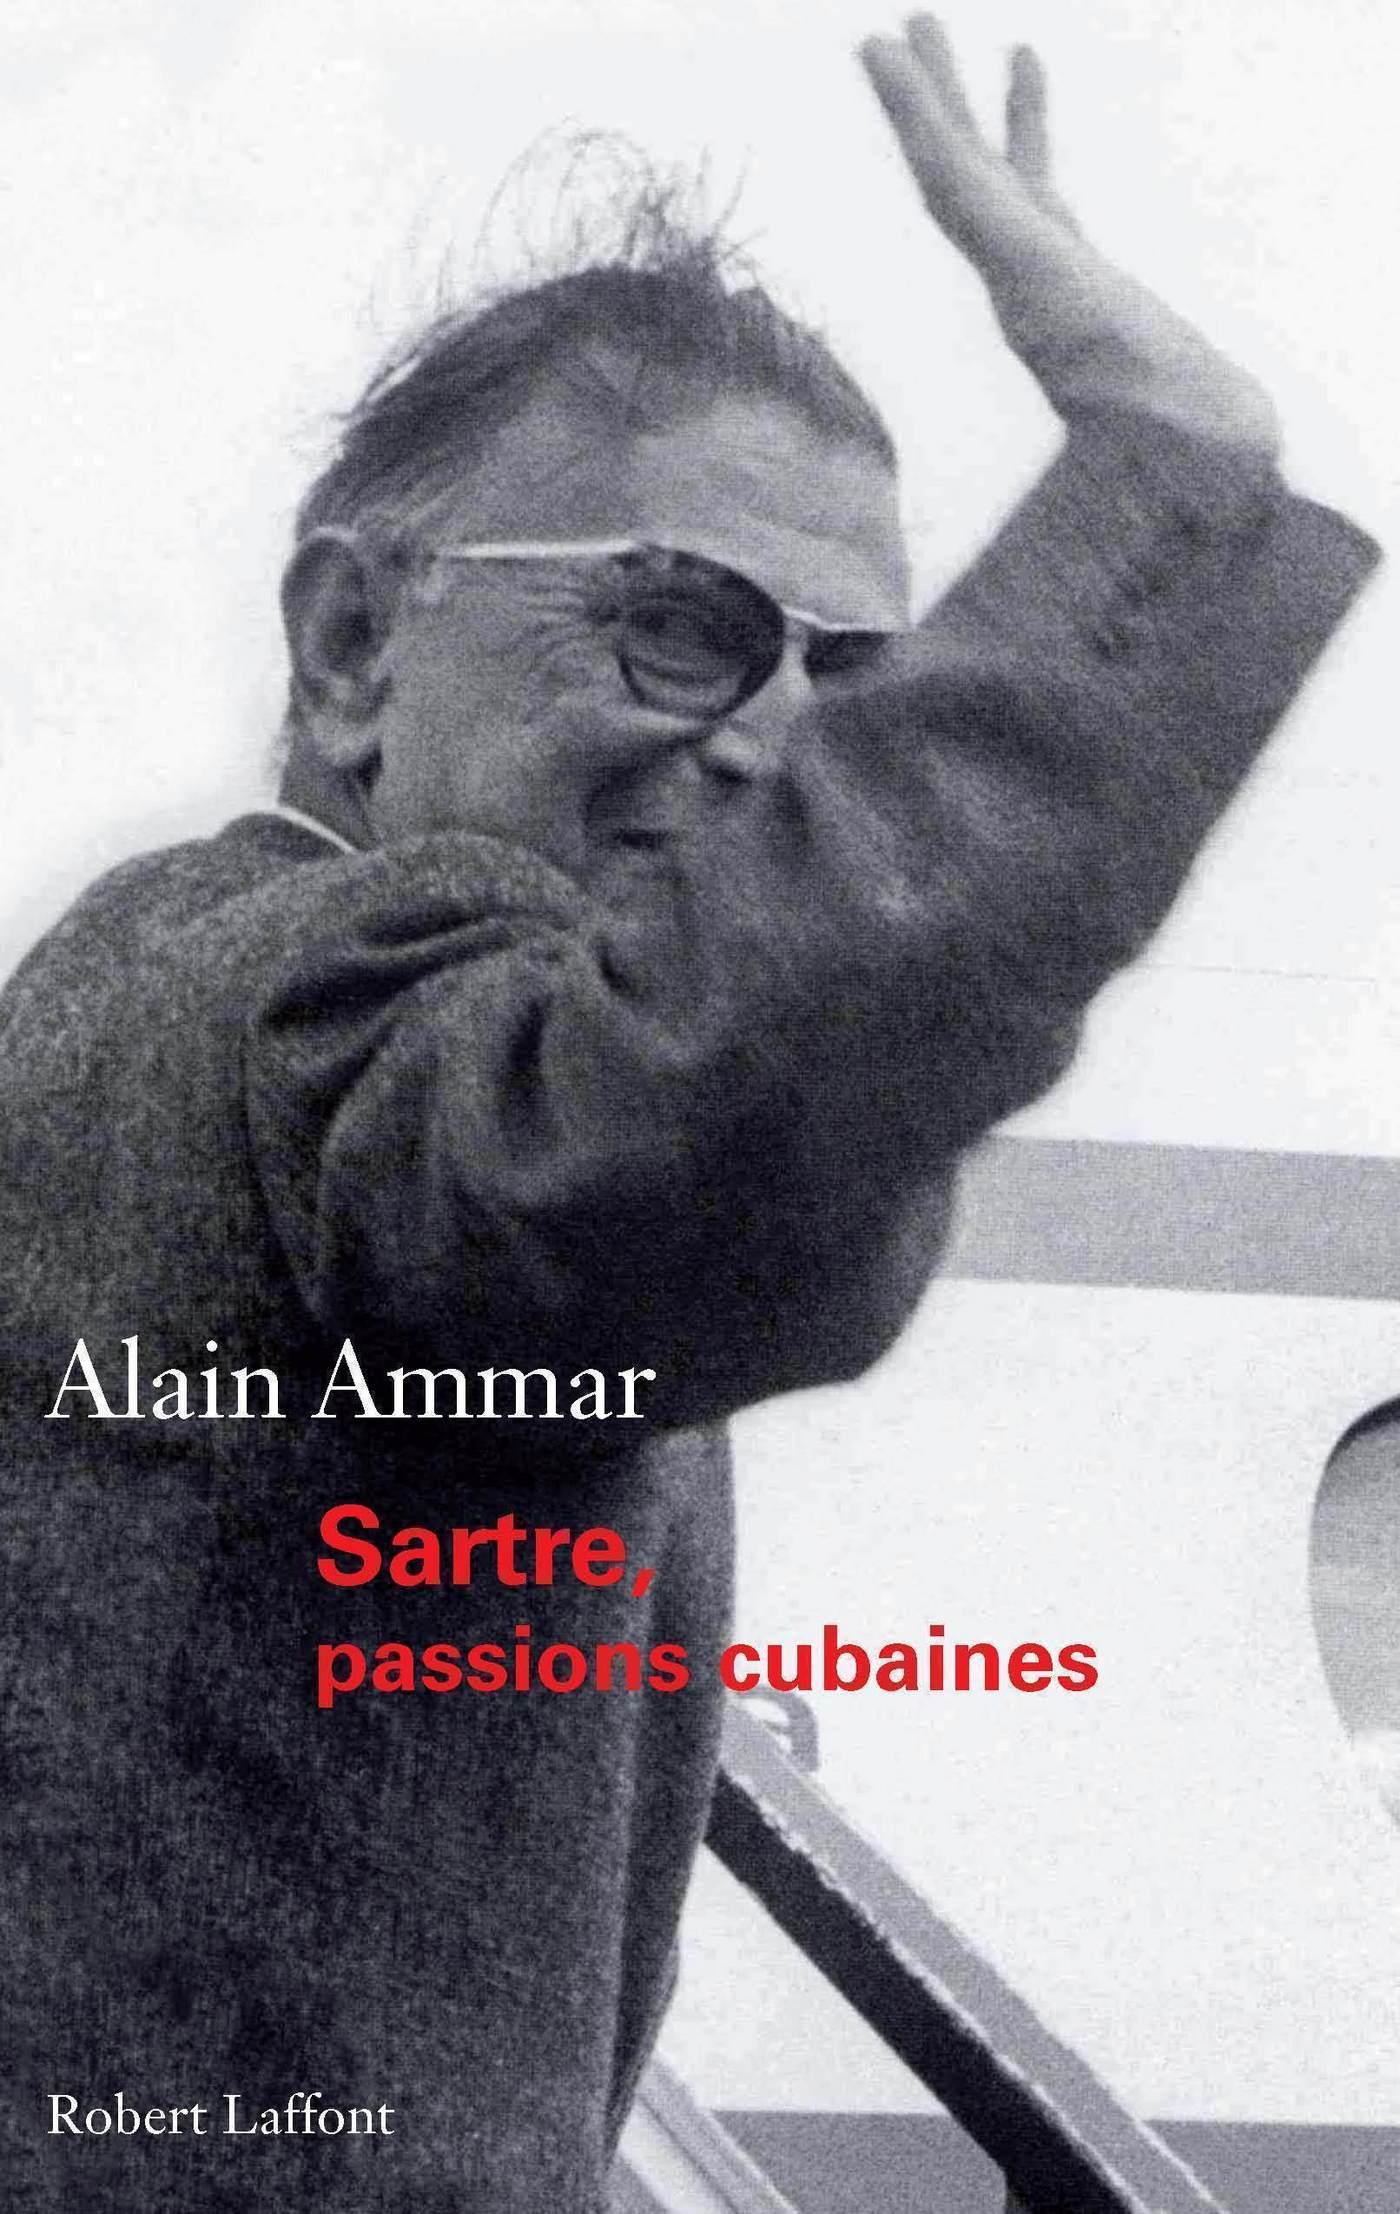 Sartre, passions cubaines